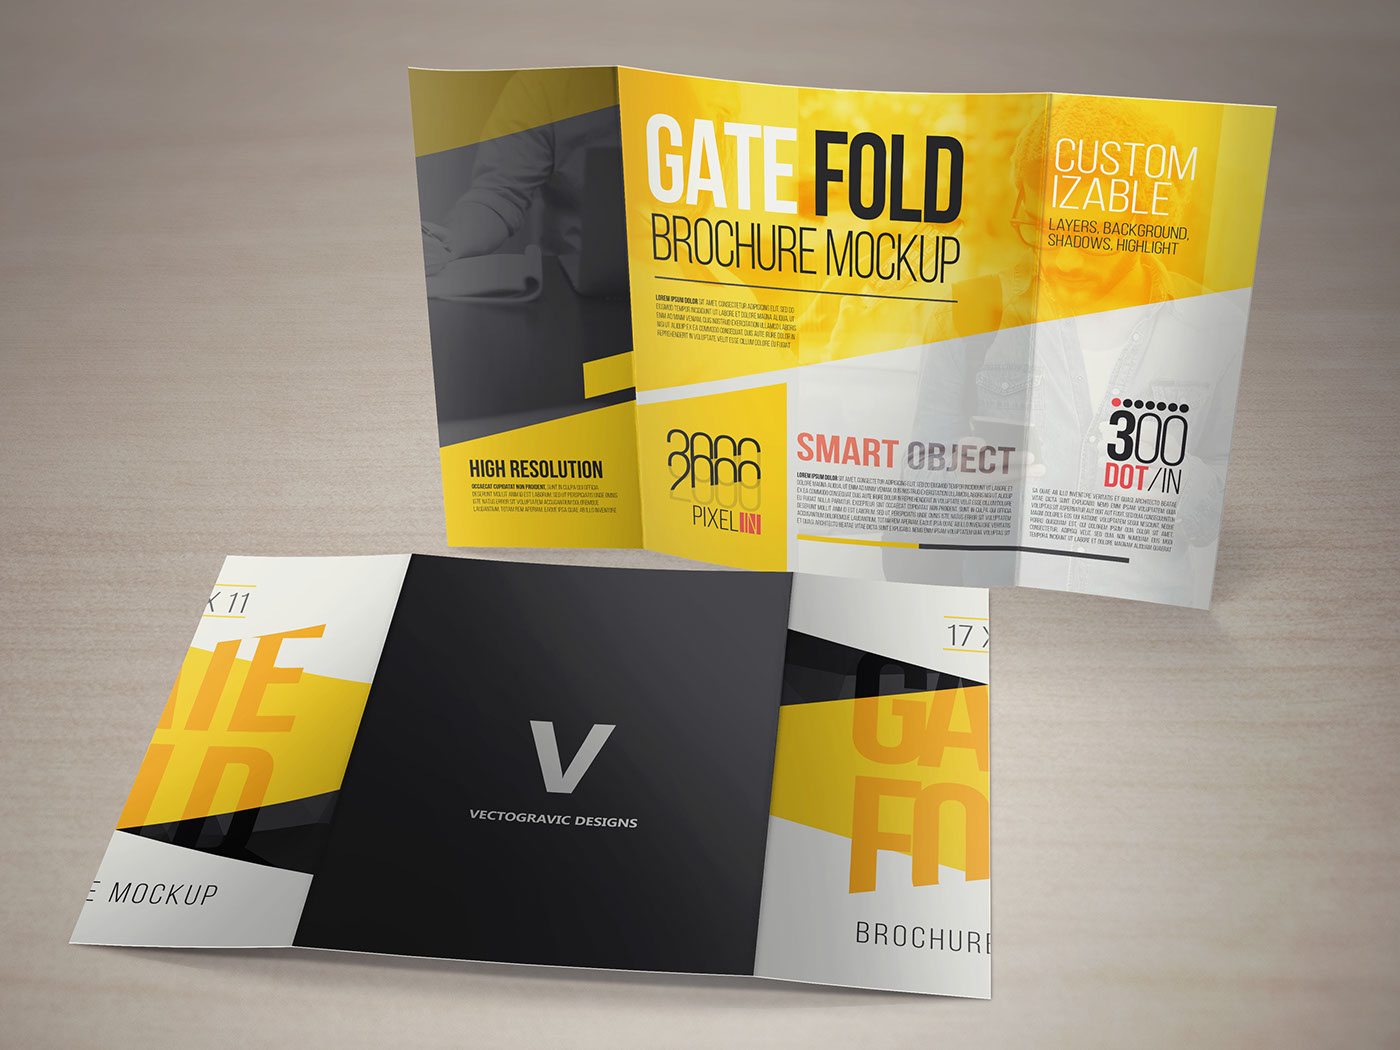 17 x 11 Gate Fold Brochure Mockup on Behance – Gate Fold Brochure Mockup